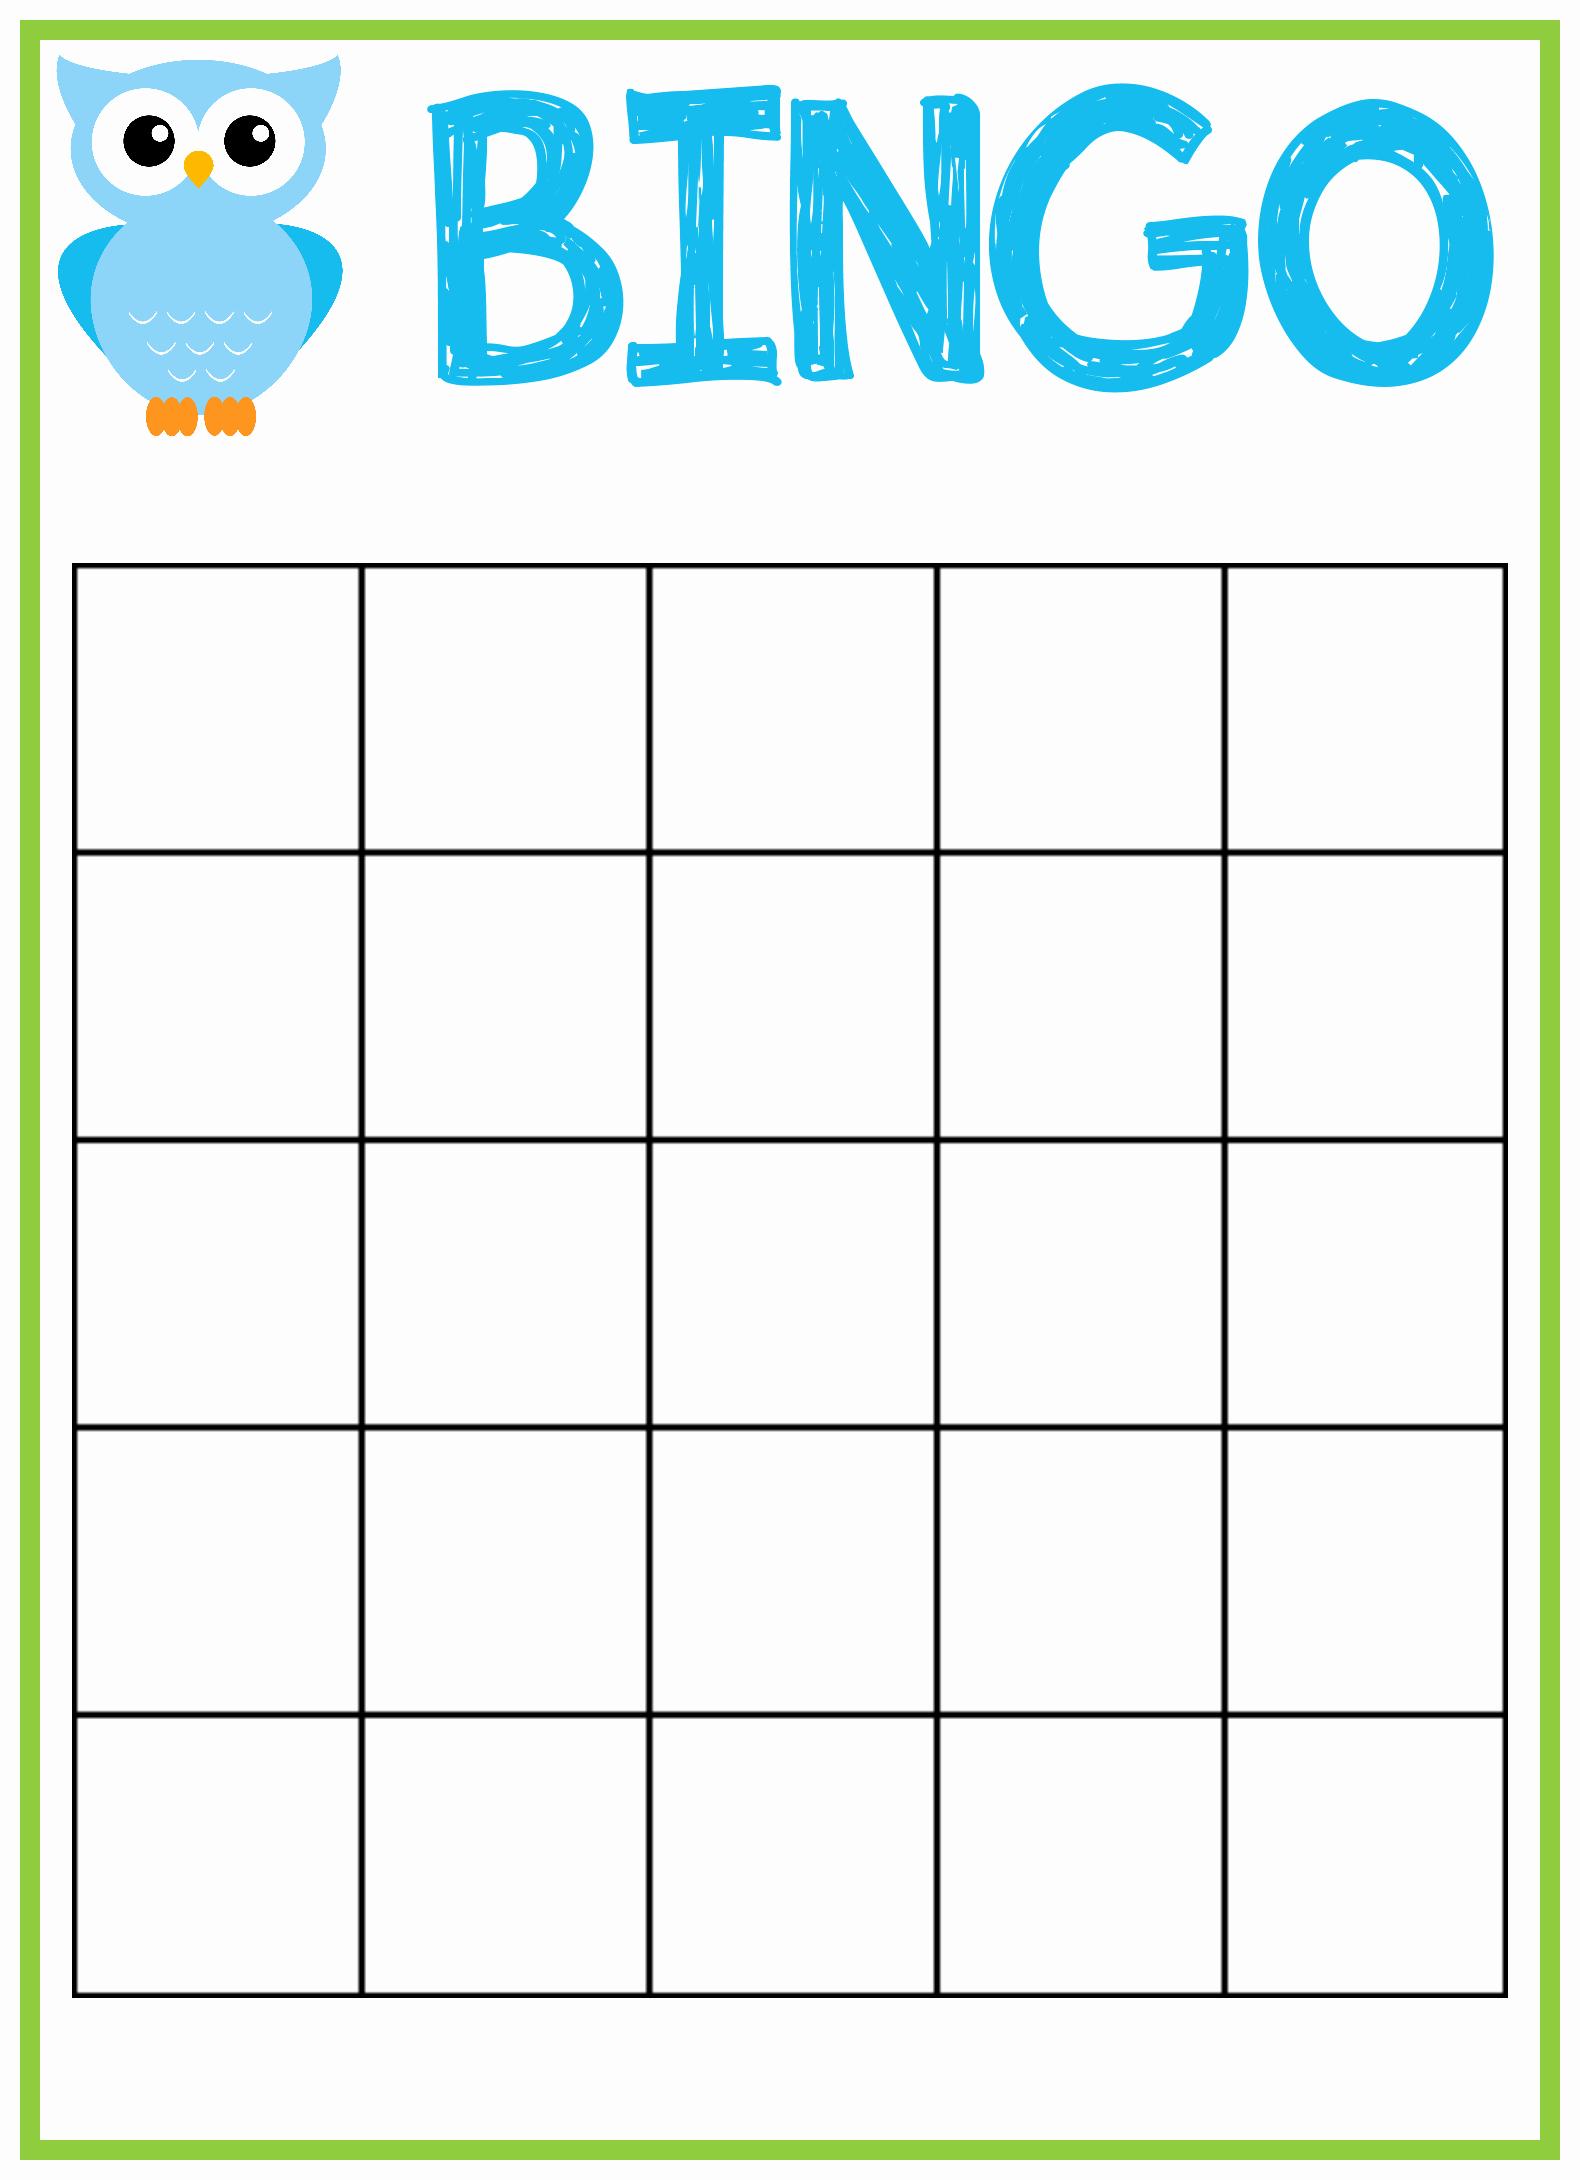 Free Printable Baby Shower Card Elegant Baby Bingo Template